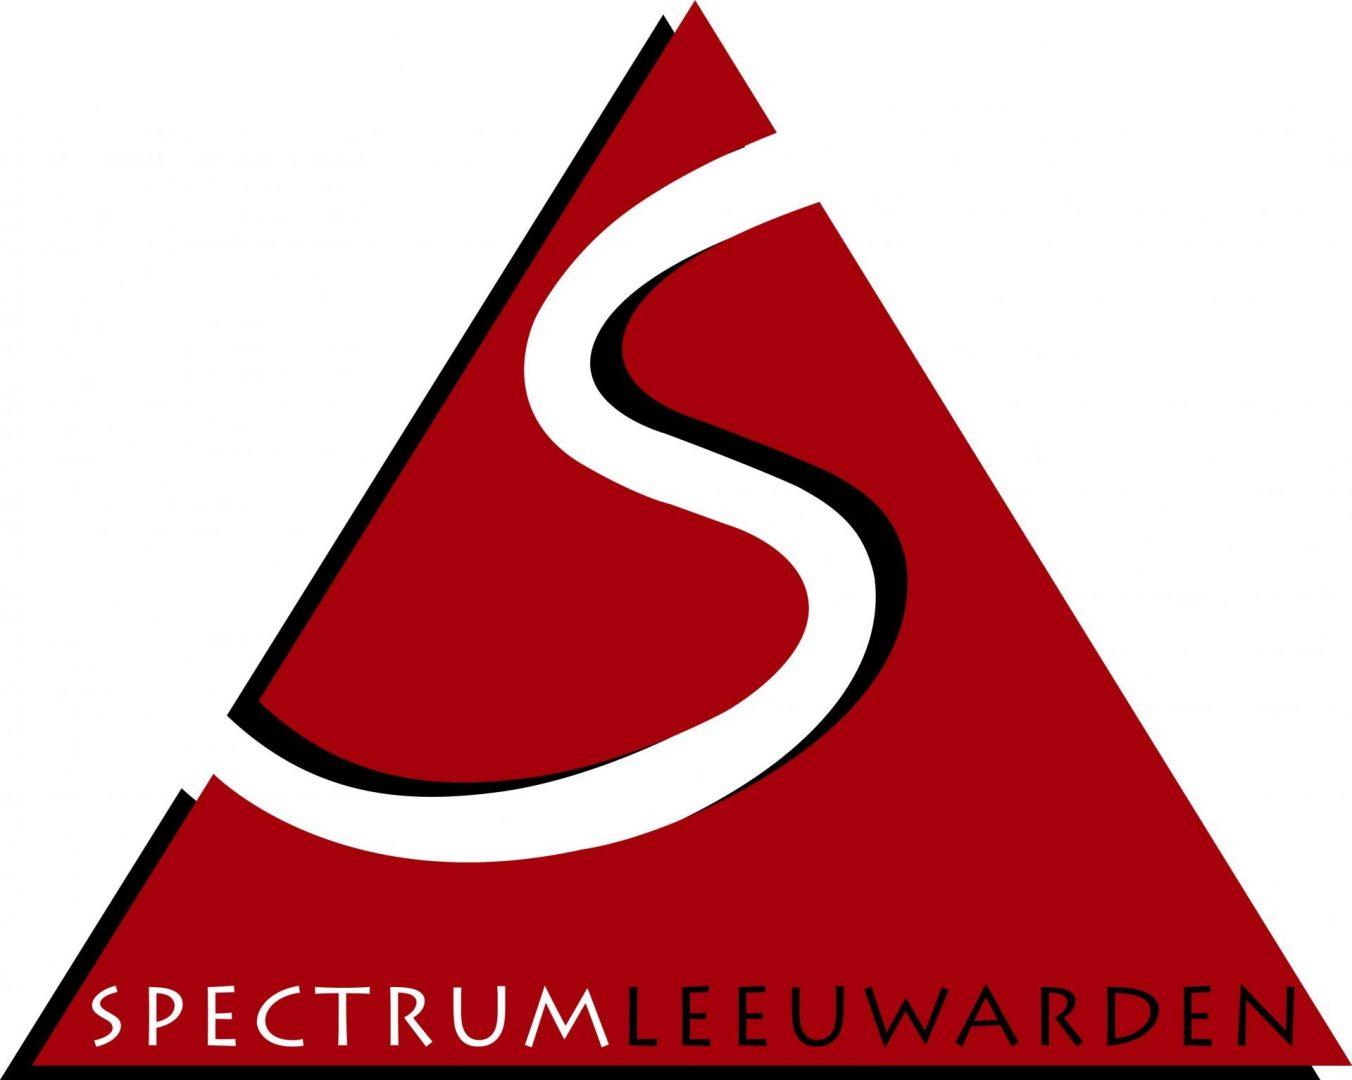 cropped-Spectrum-logo-scaled-1.jpg